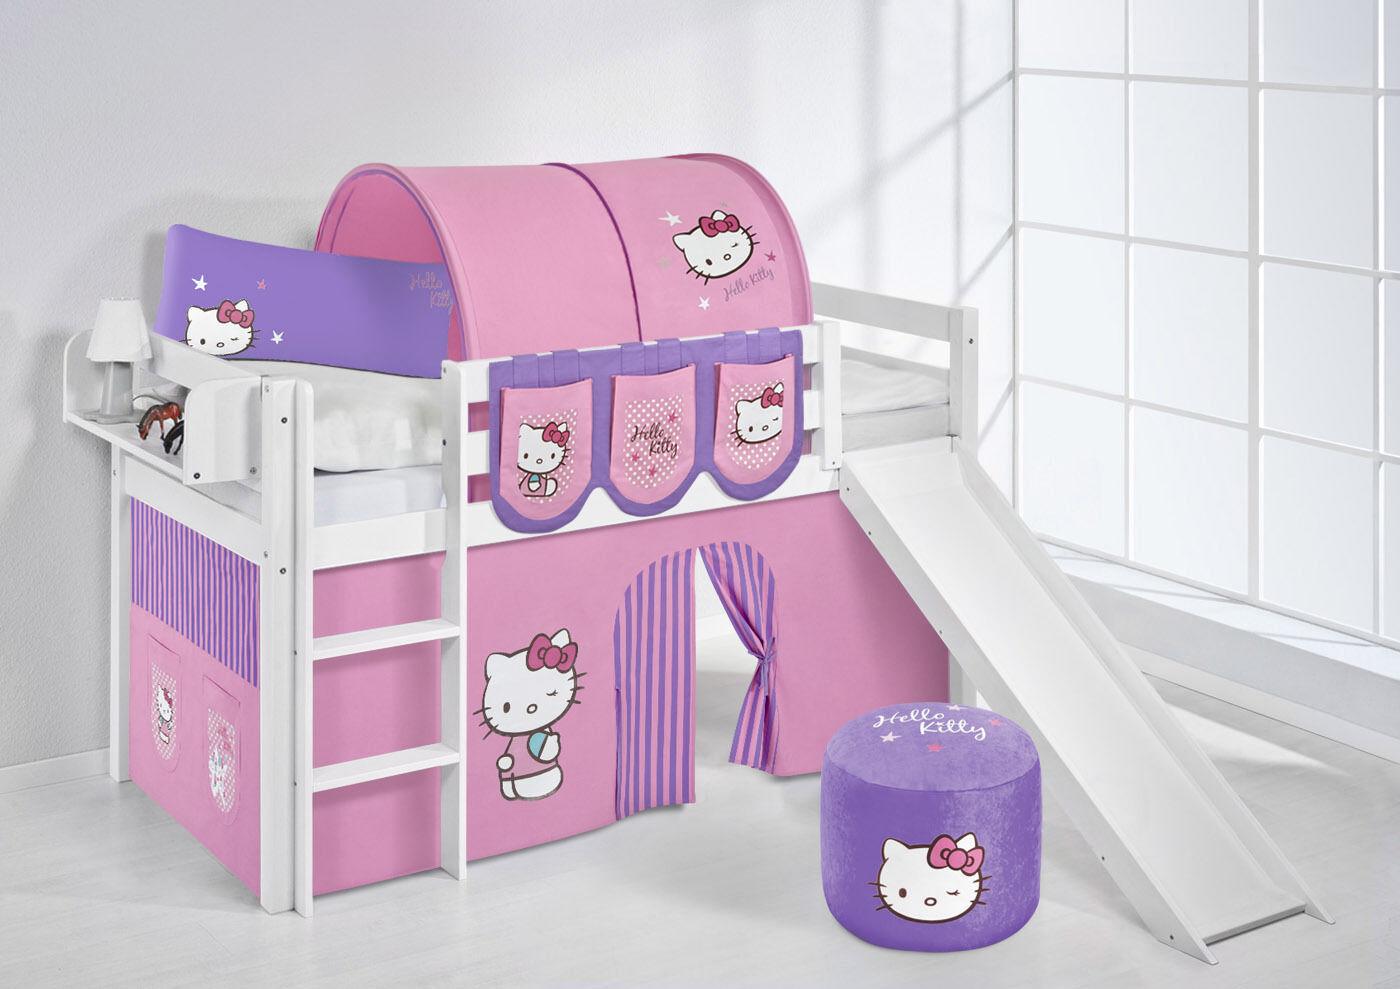 Lit Mezzanine de Jelle 190x90 Blanc avec Toboggan Enfants Lilo Hello Kitty Mauve